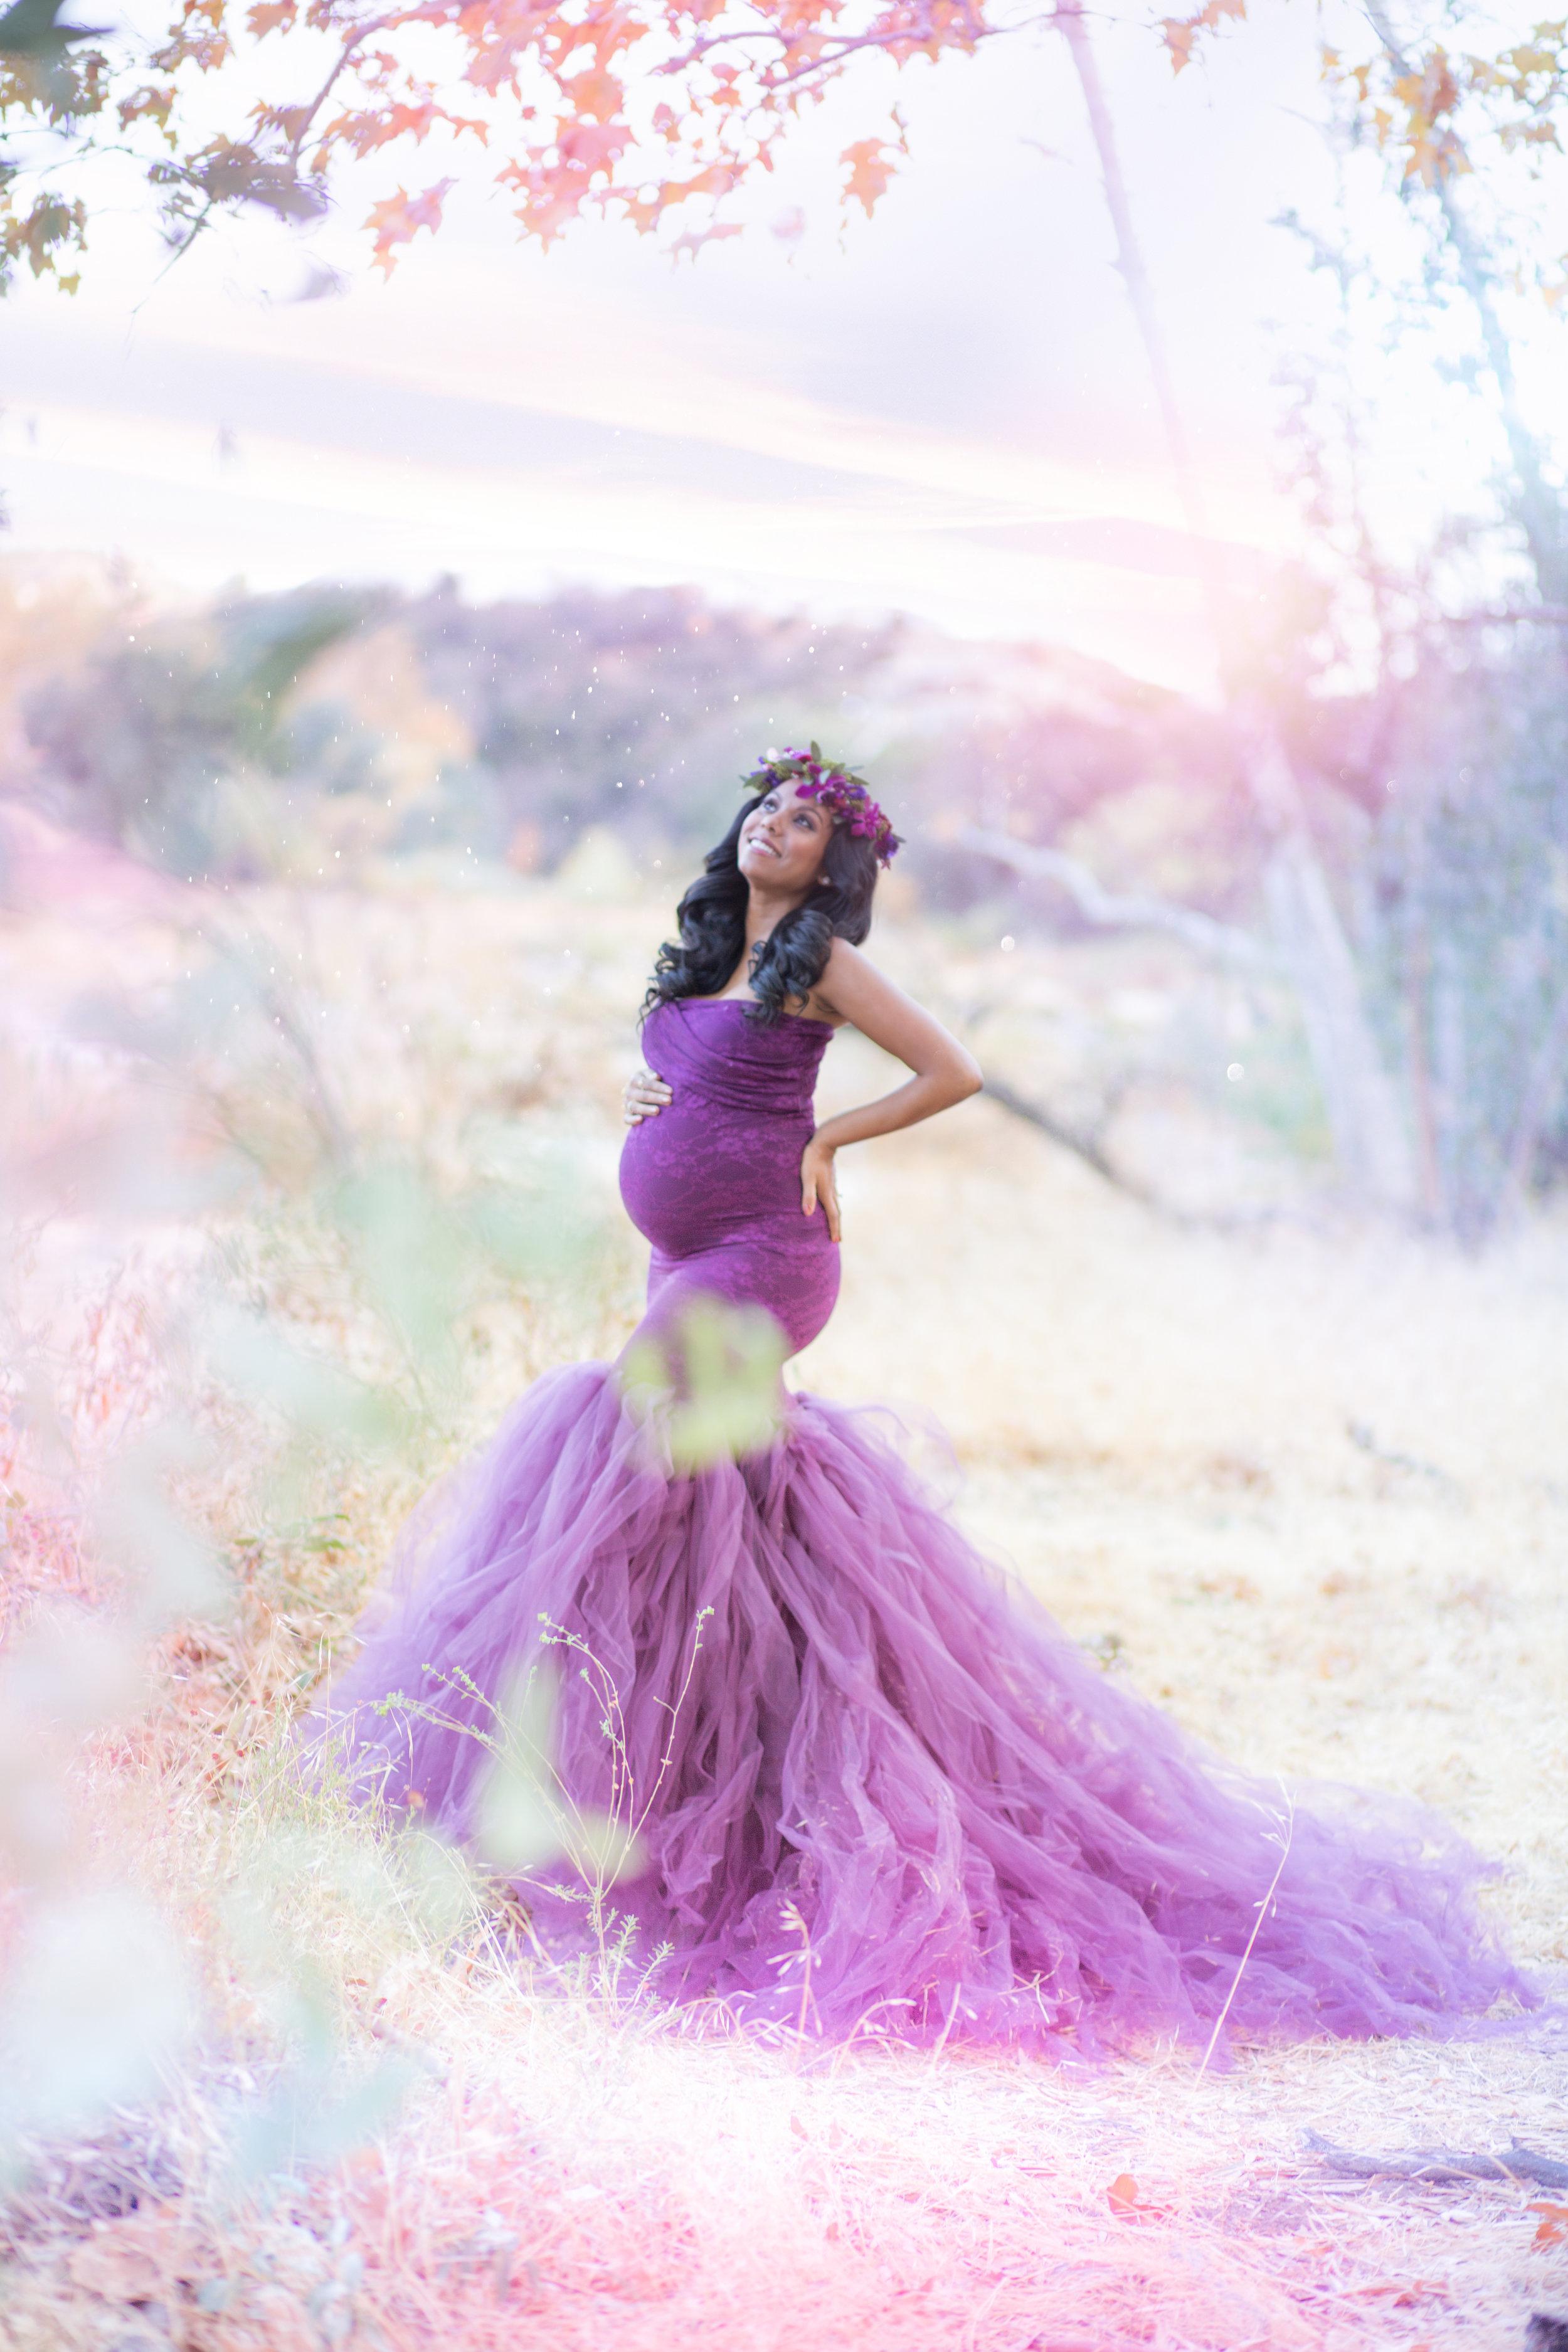 MATERNITY - A Journey into Motherhood